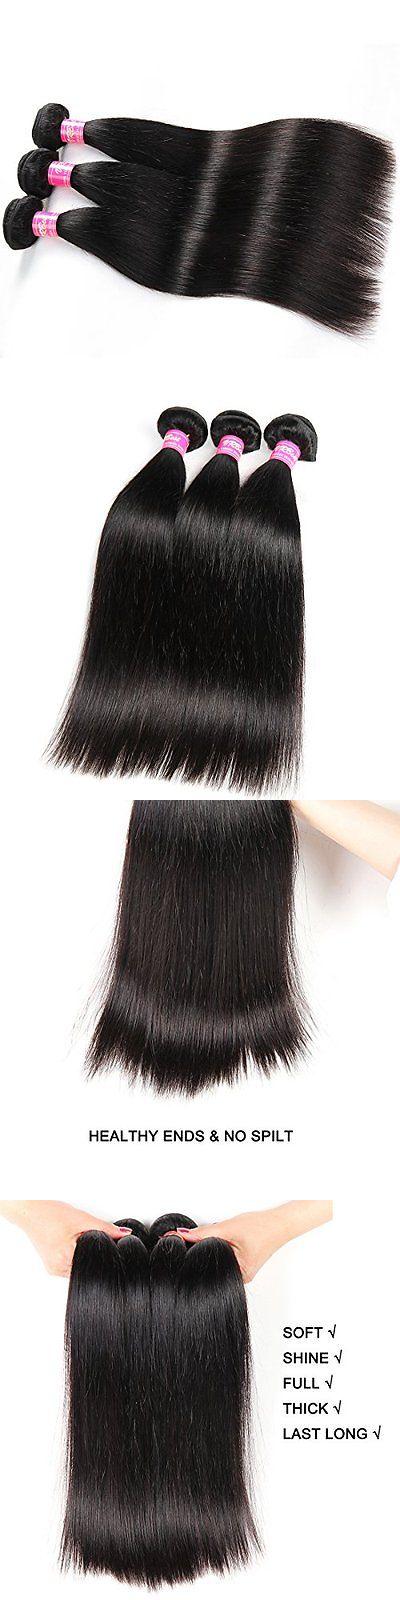 Hair Extensions Hair Virgin Straight Human Extensions 3 Bundles